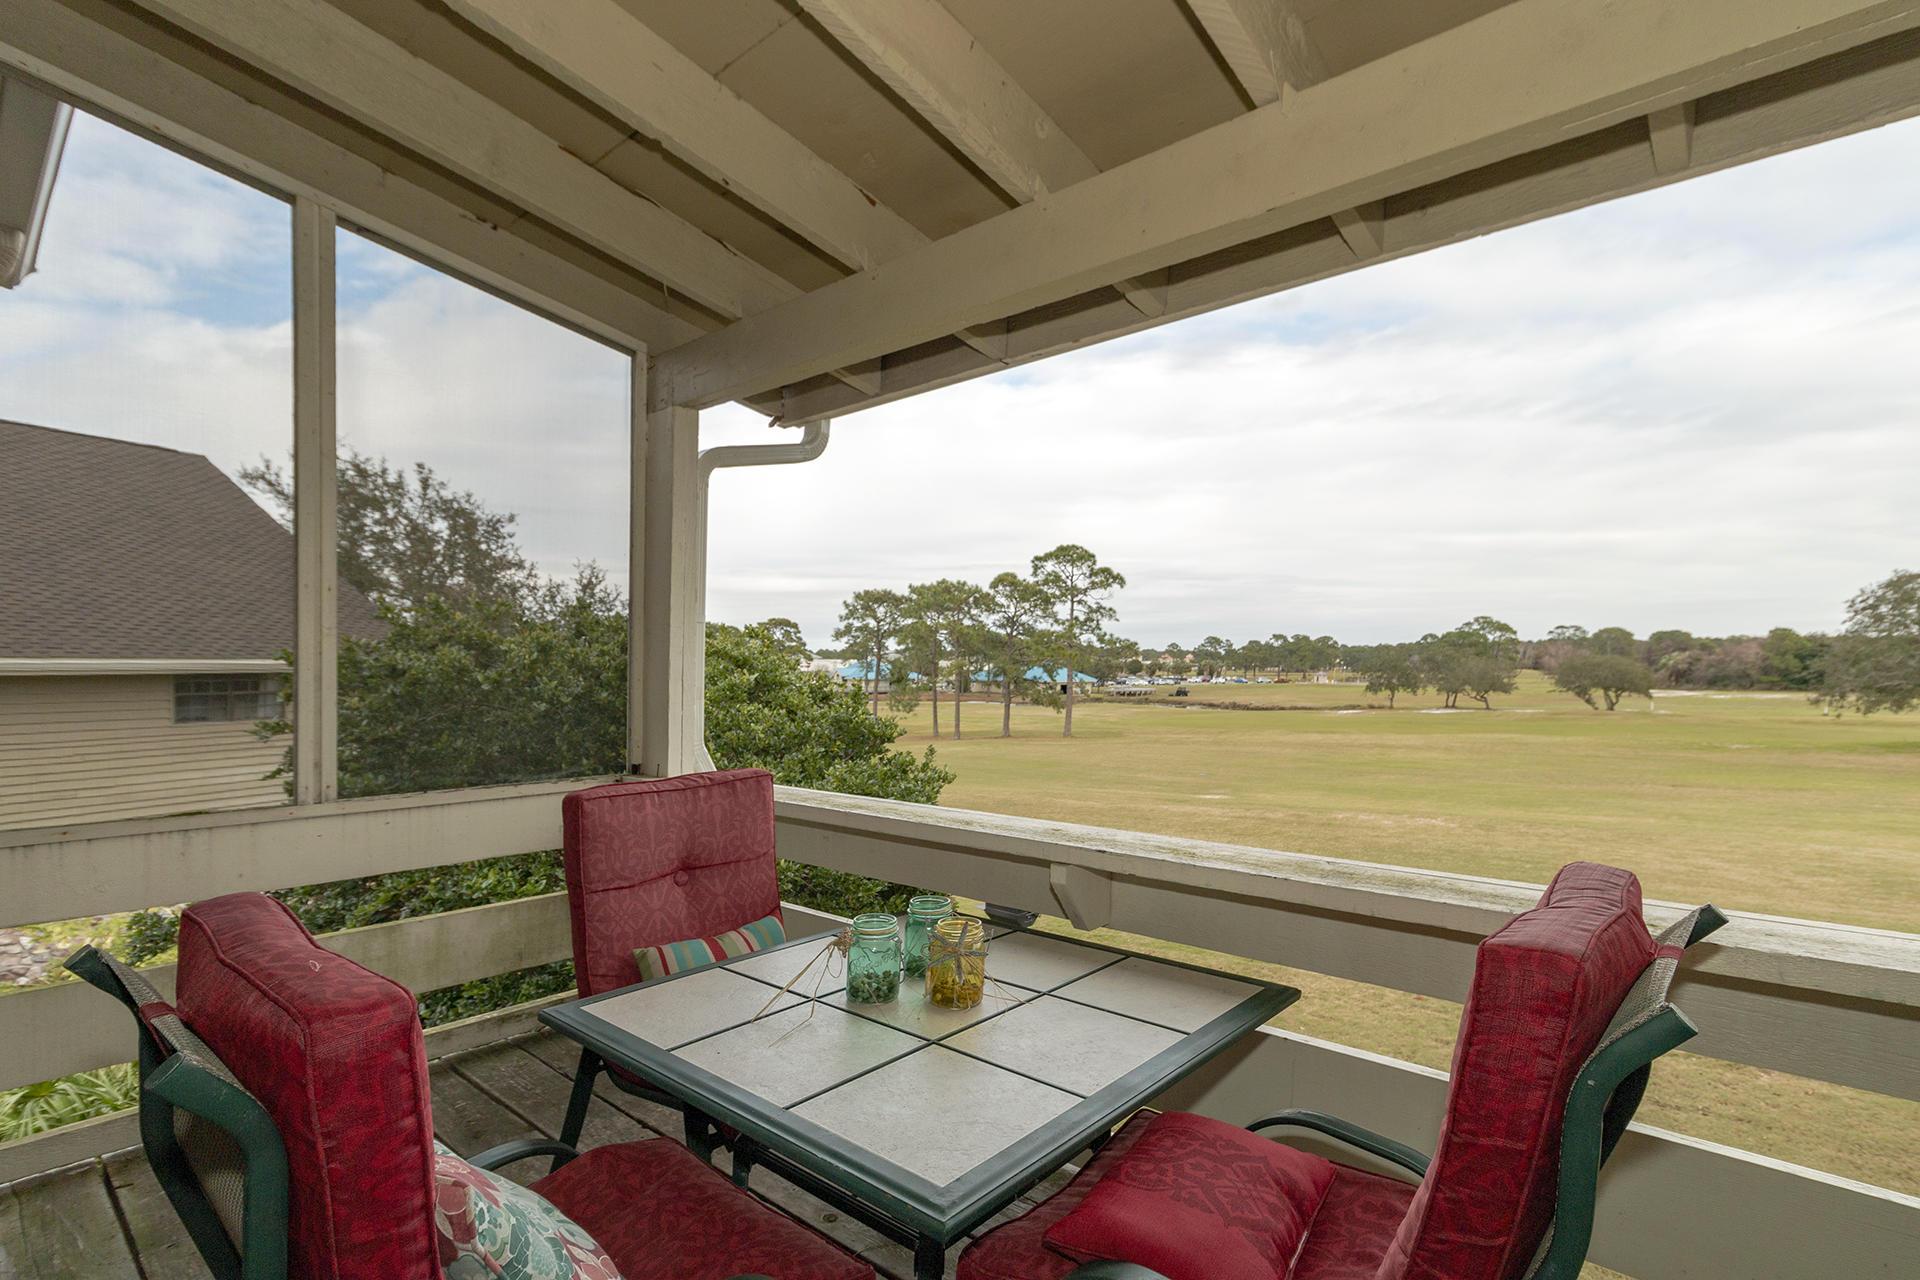 Miramar Beach Real Estate Listing, featured MLS property E814333